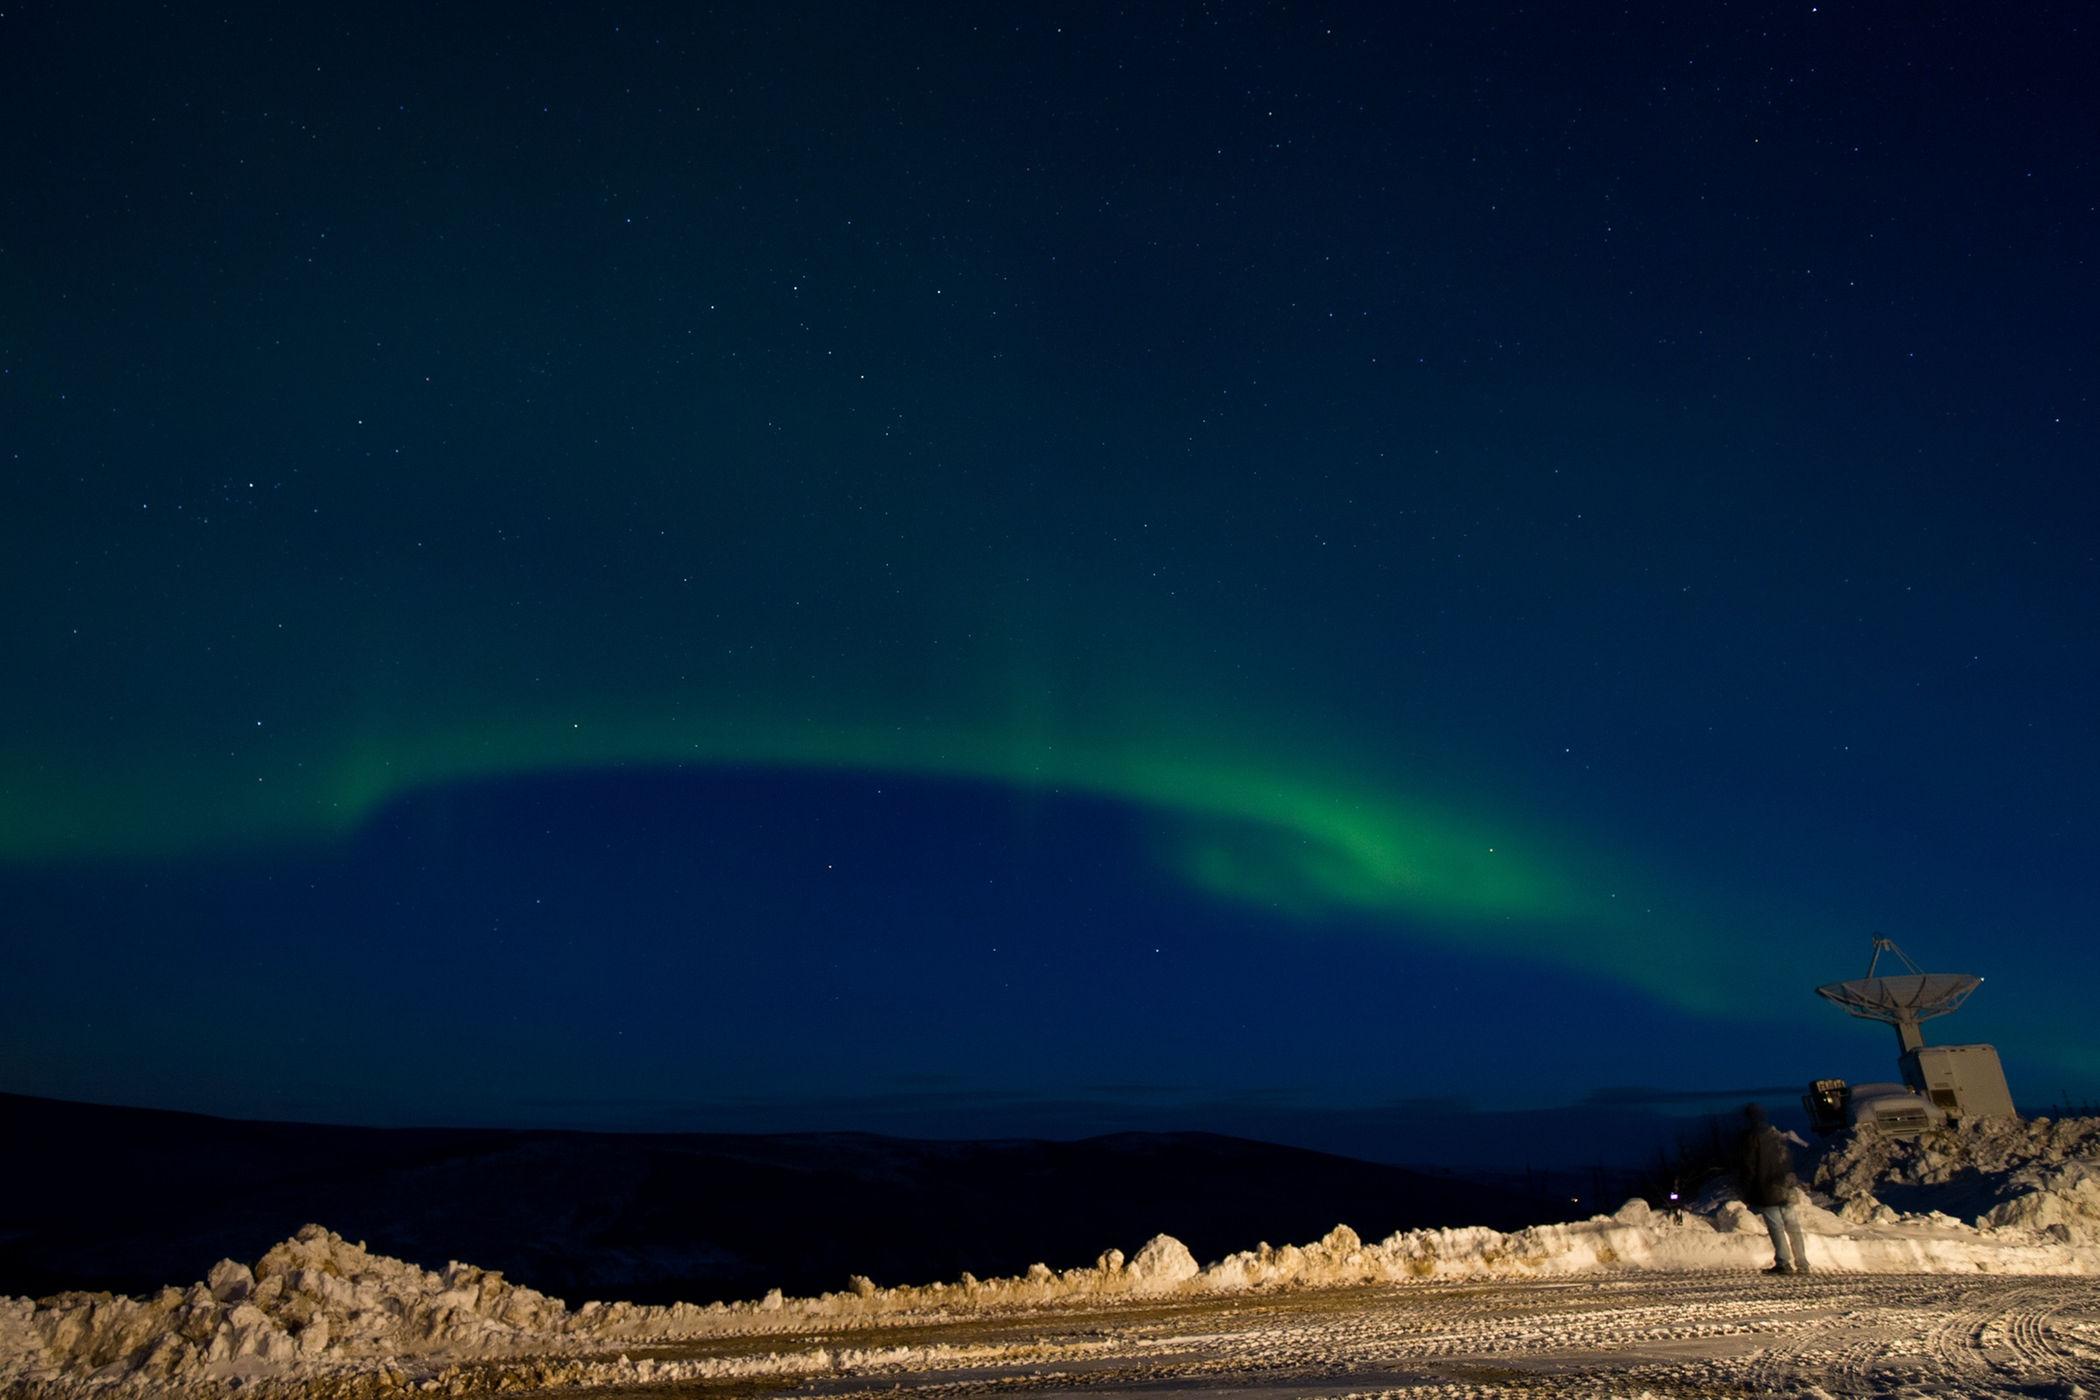 NASA's Aurora-Watching Rocket Campaign Blasts Off